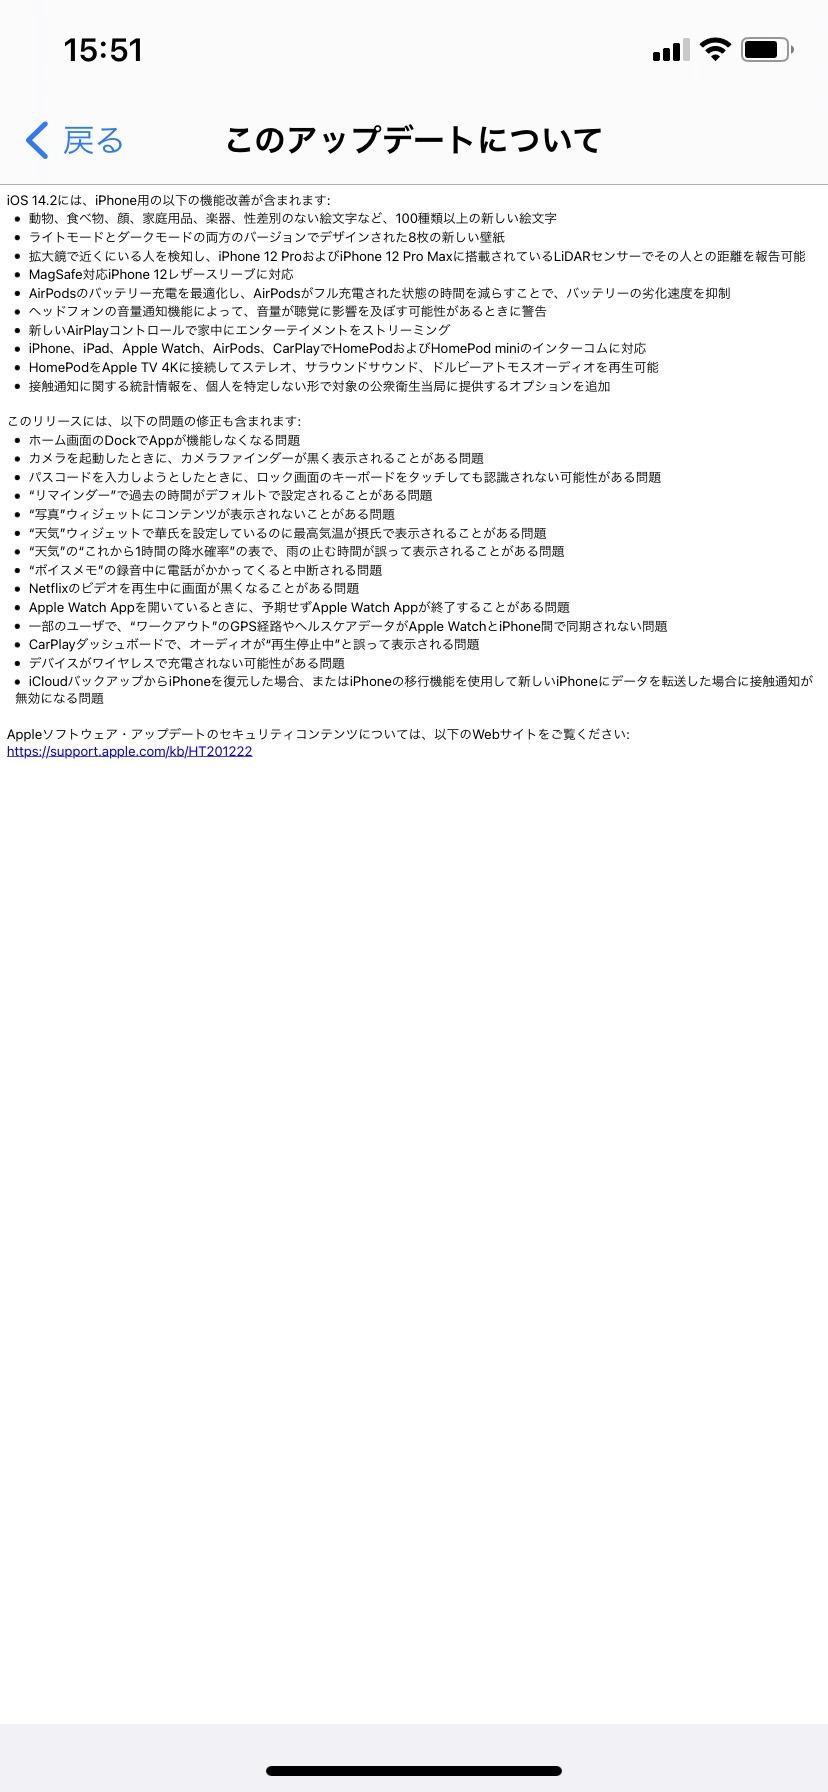 iOS14.2の追加機能と不具合修正のAppleの文書